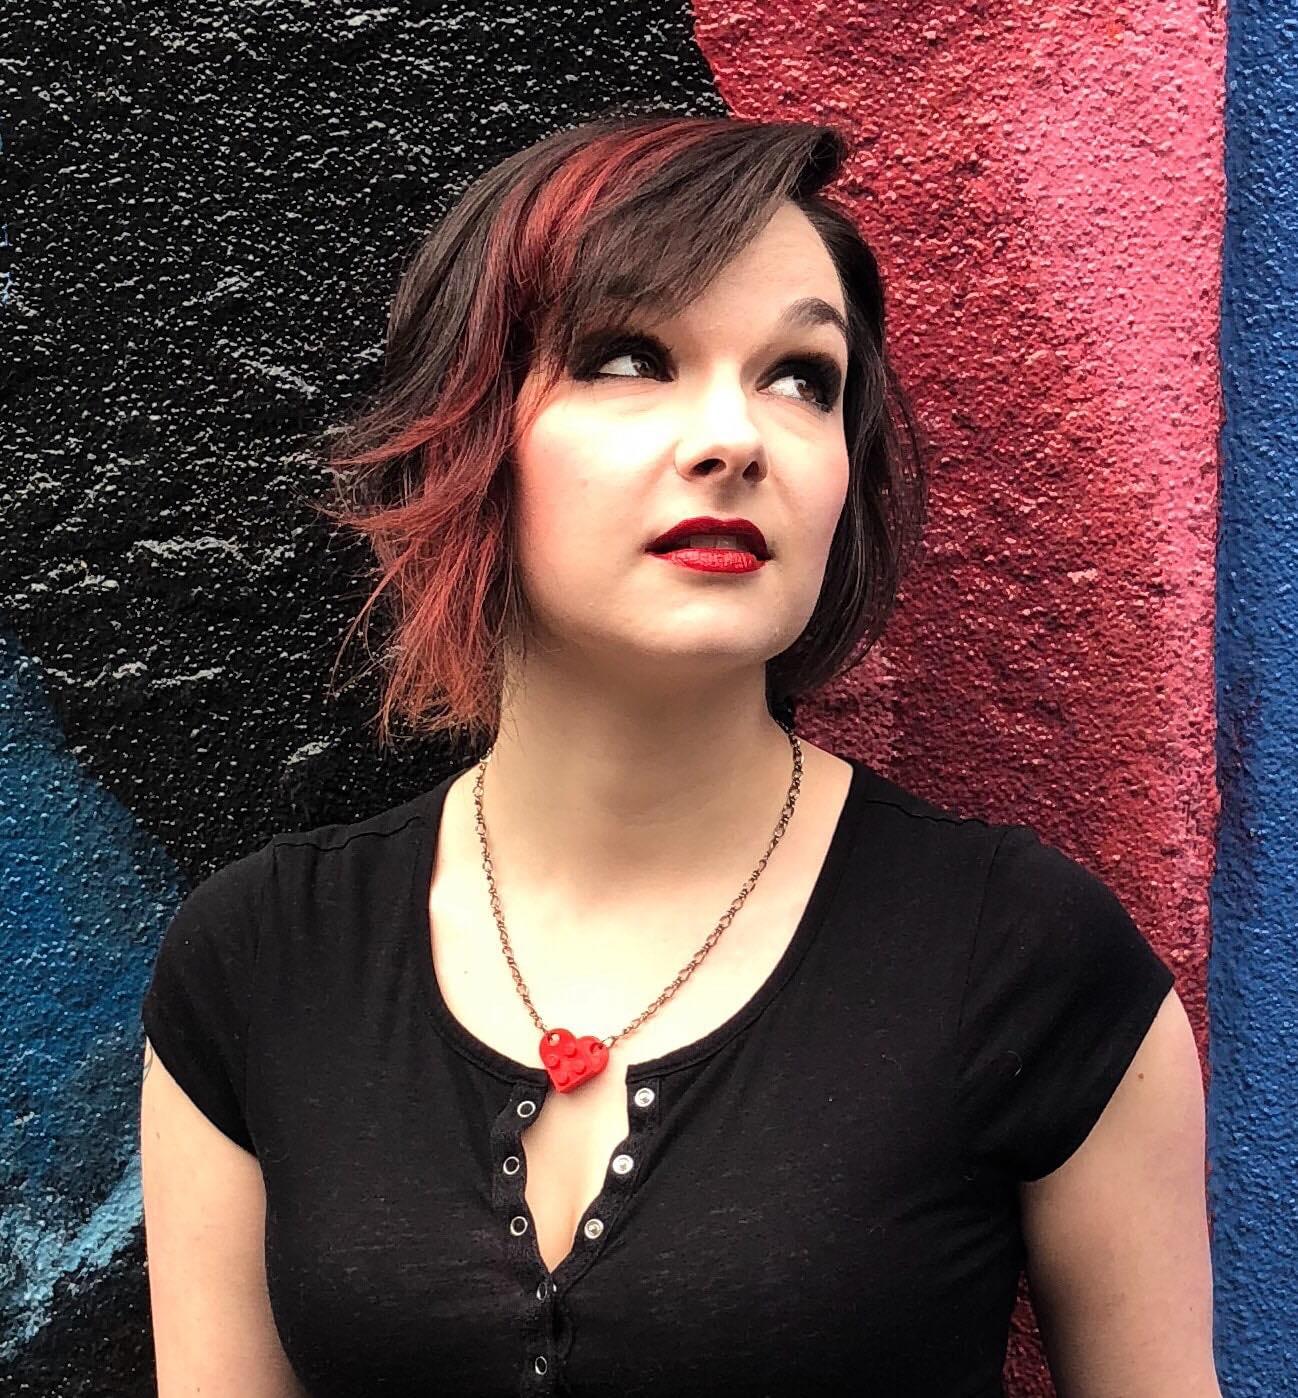 Tifa Robles